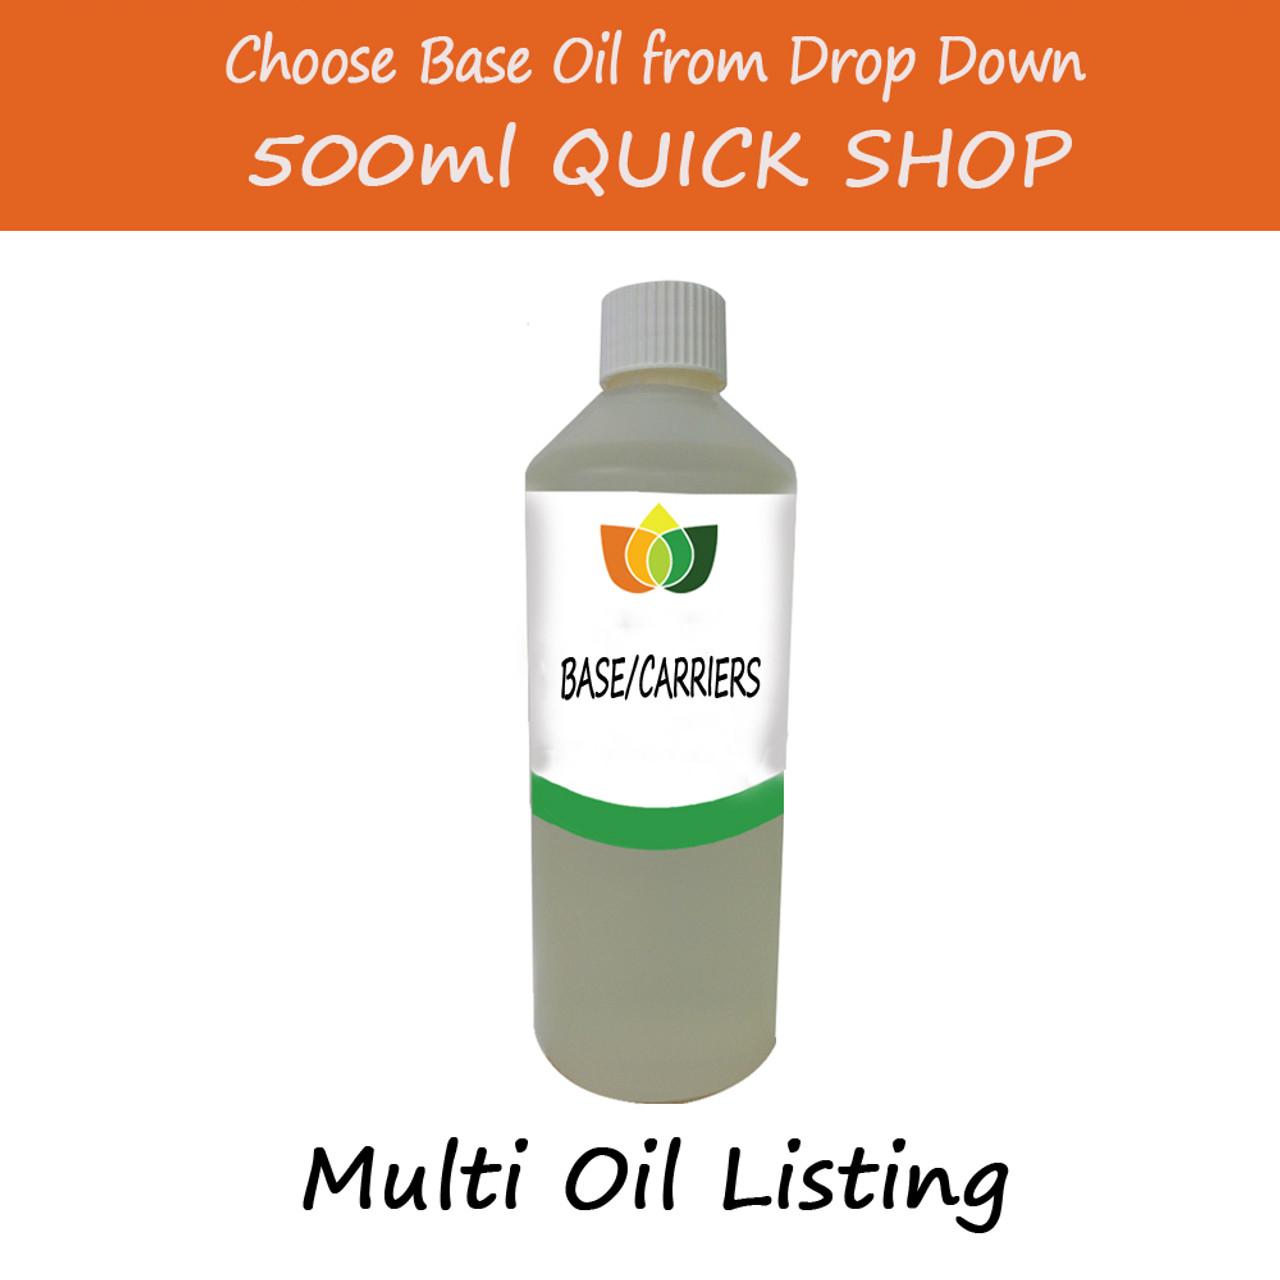 500ml Base/Carrier Massage Oil - Choose Variety Refined Virgin & Unrefined